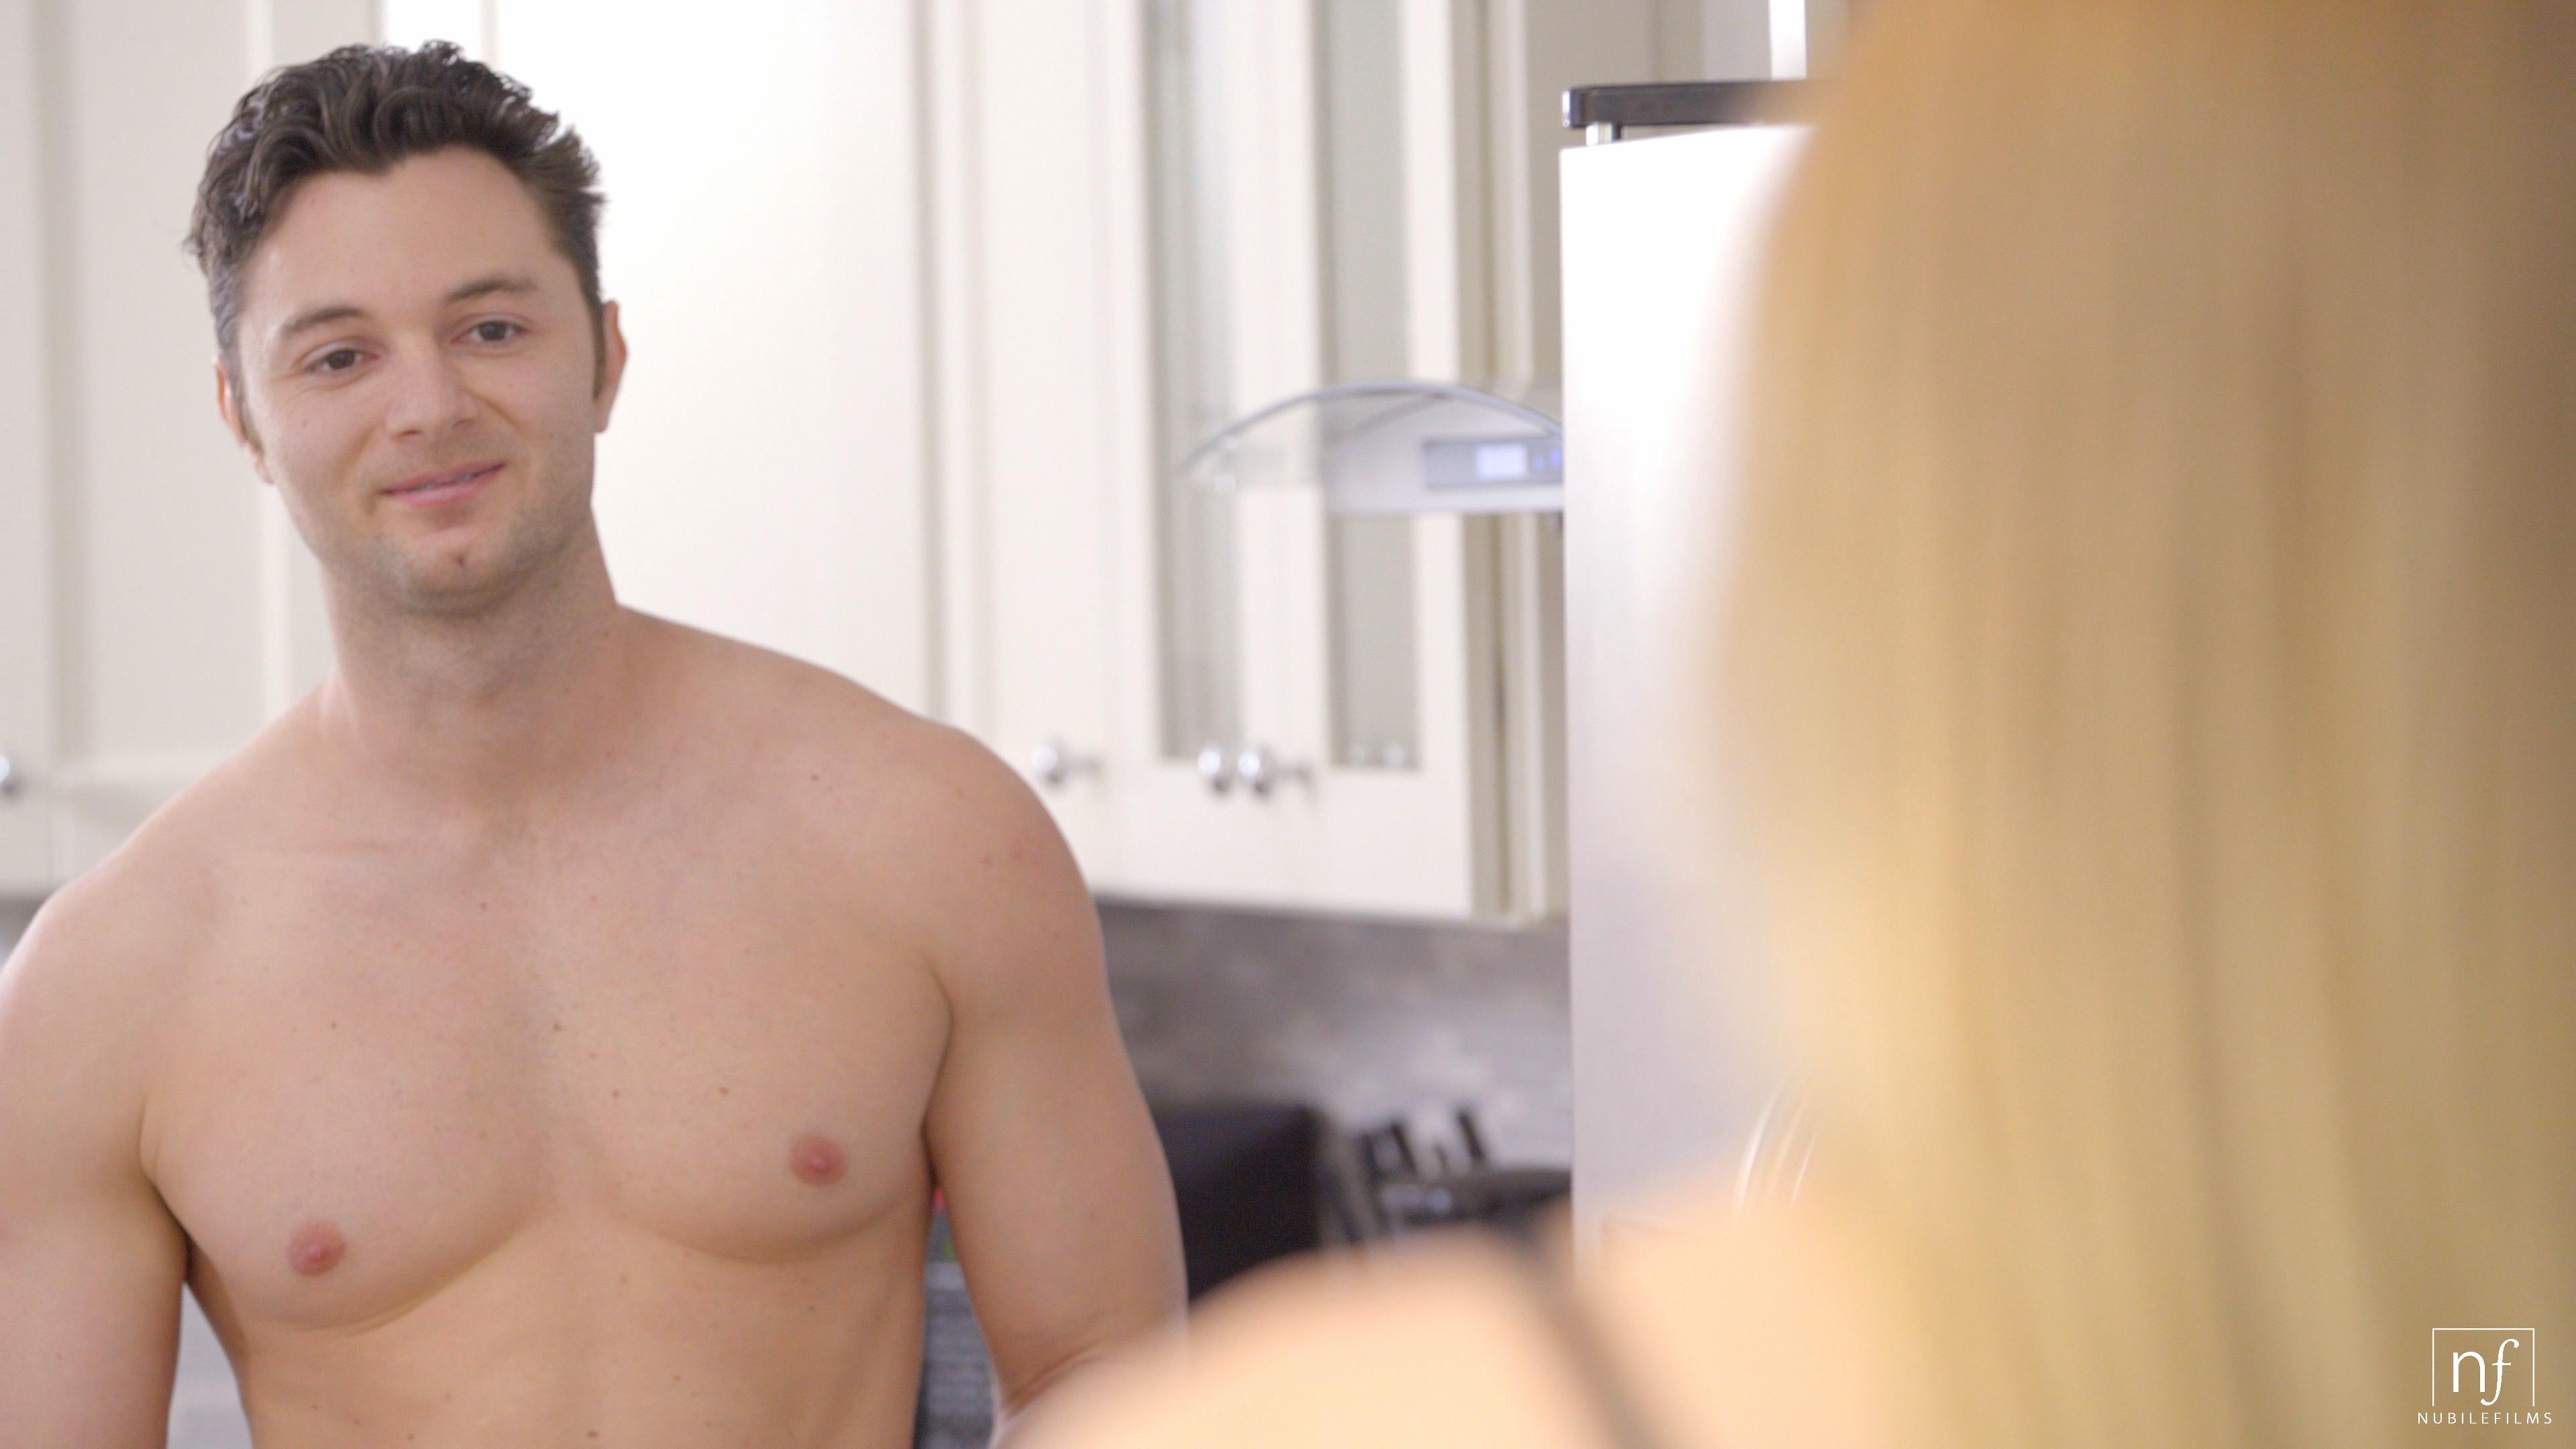 NubileFilms.com - Brad Sterling,Riley Reyes: Morning Desire - S31:E18